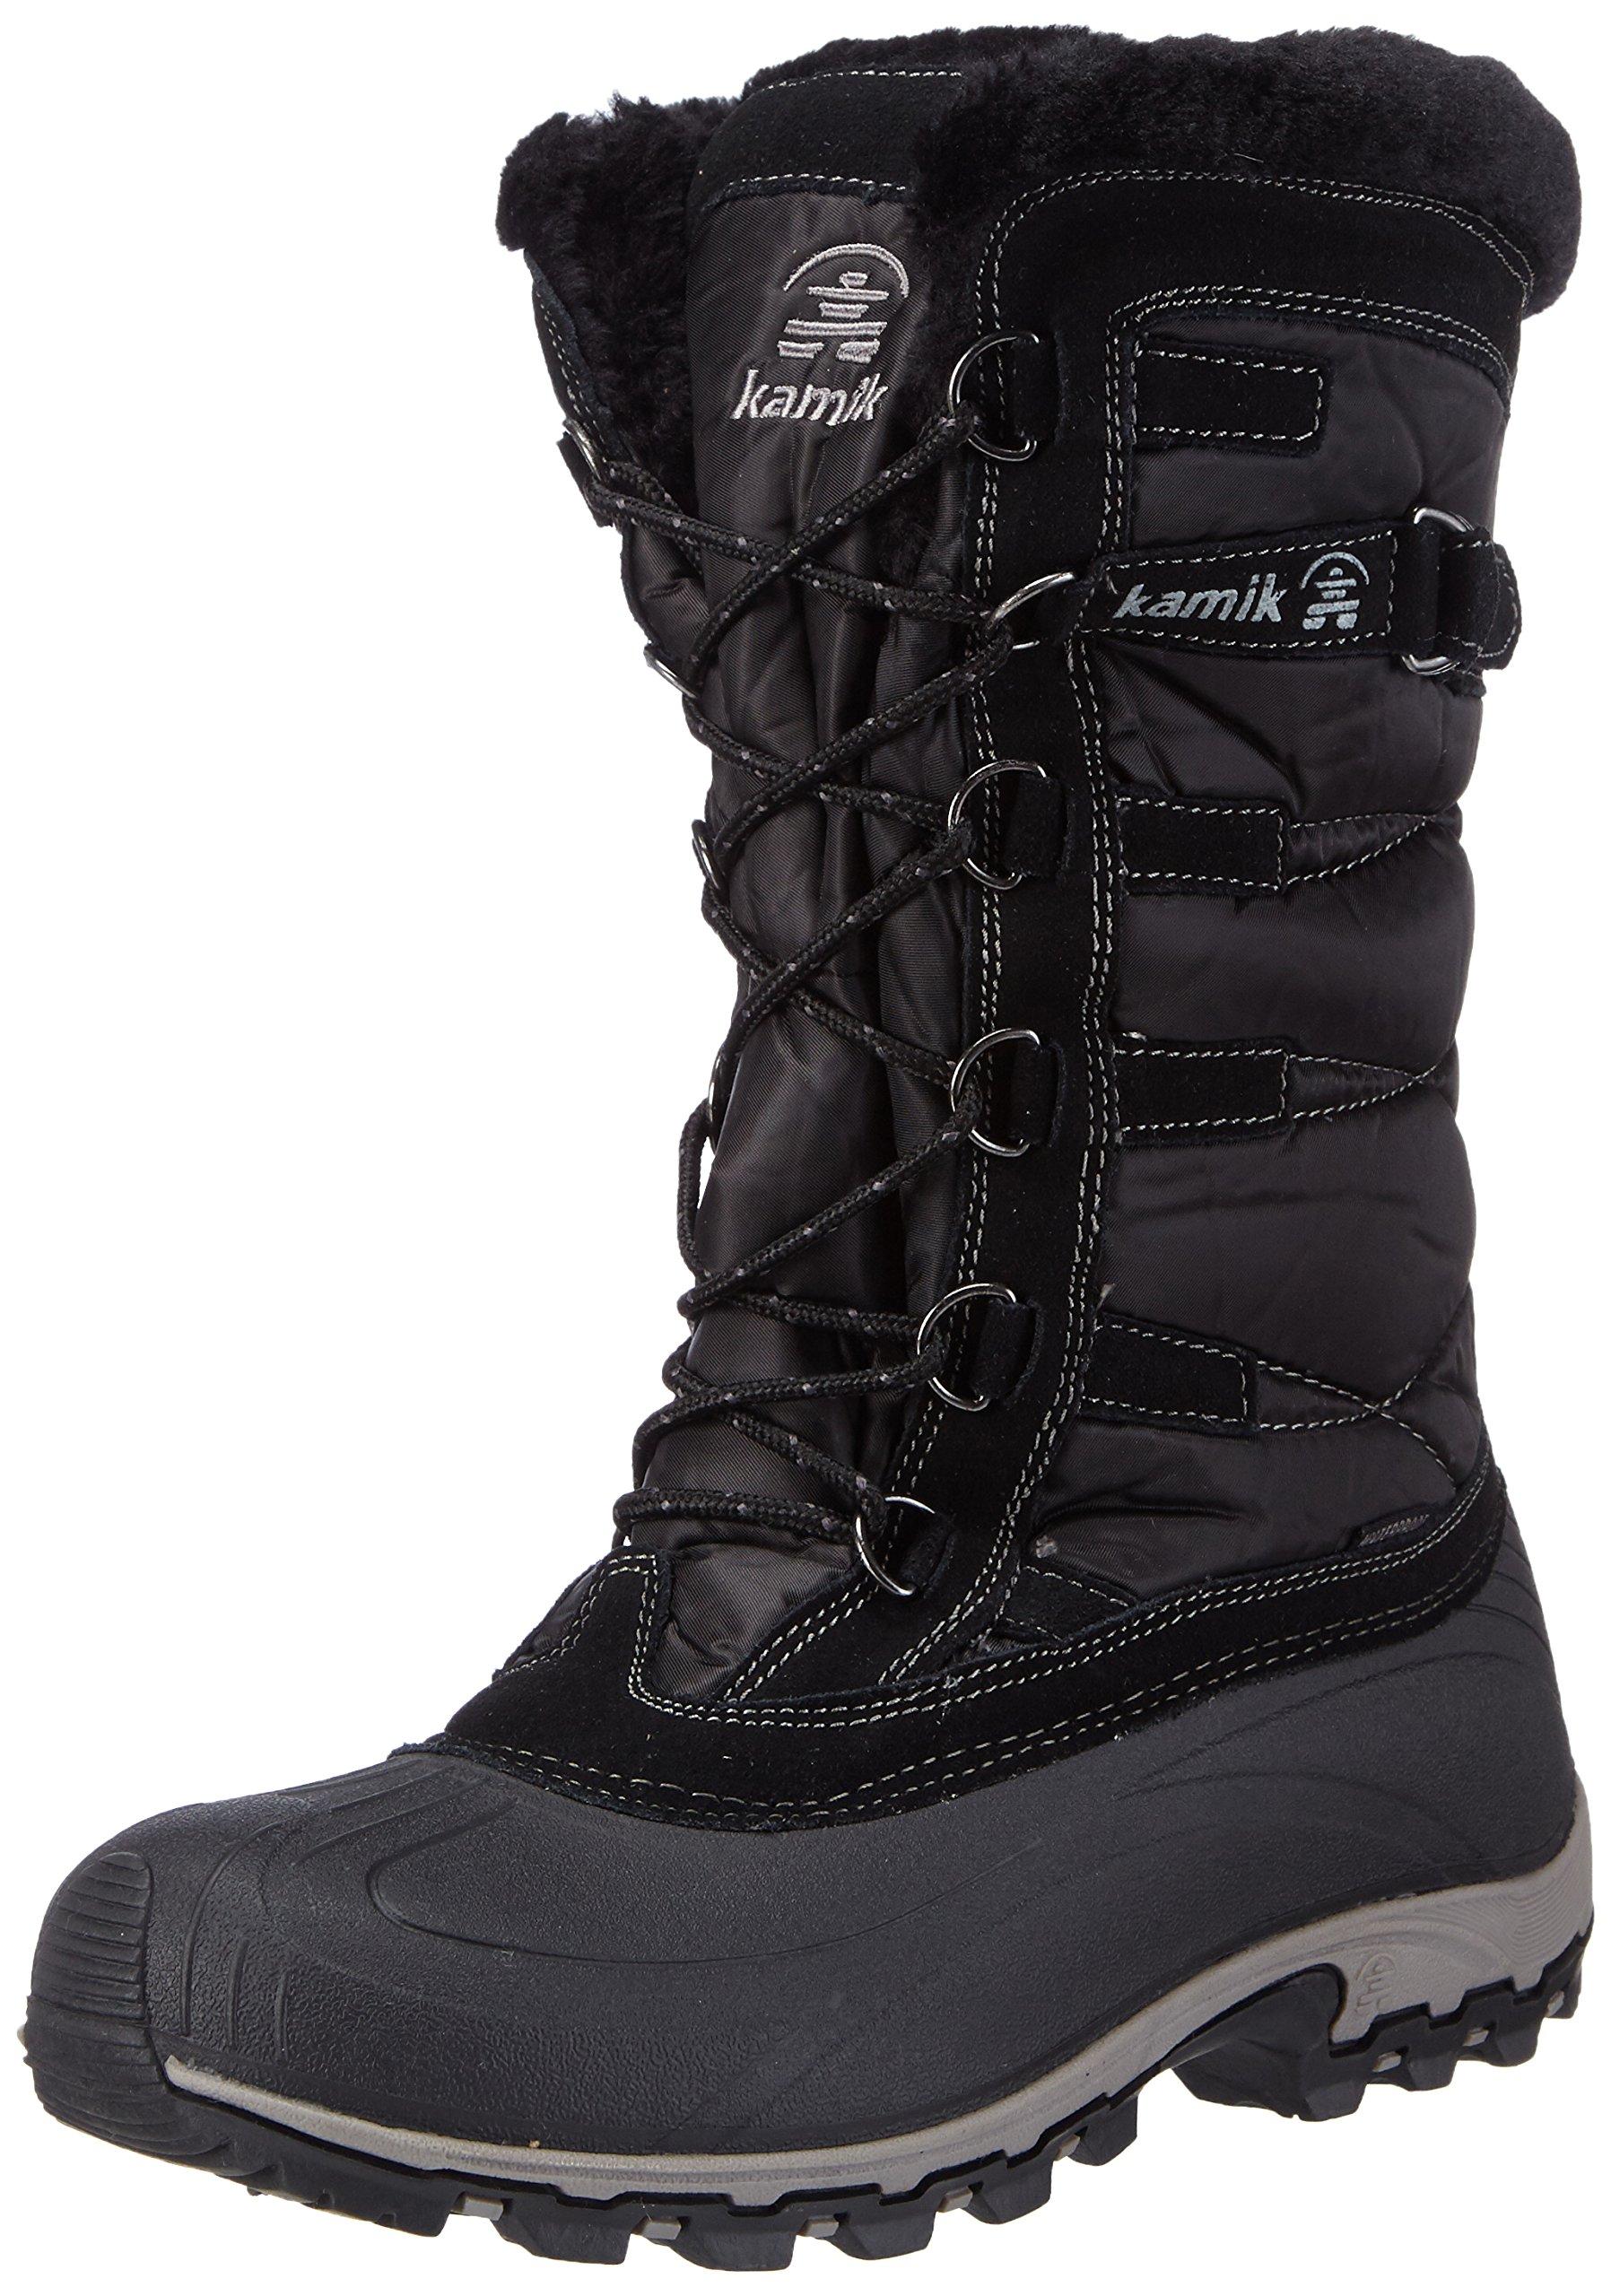 Kamik Women's Snowvalley Winter Snow Boot,Black BK2,8 M US